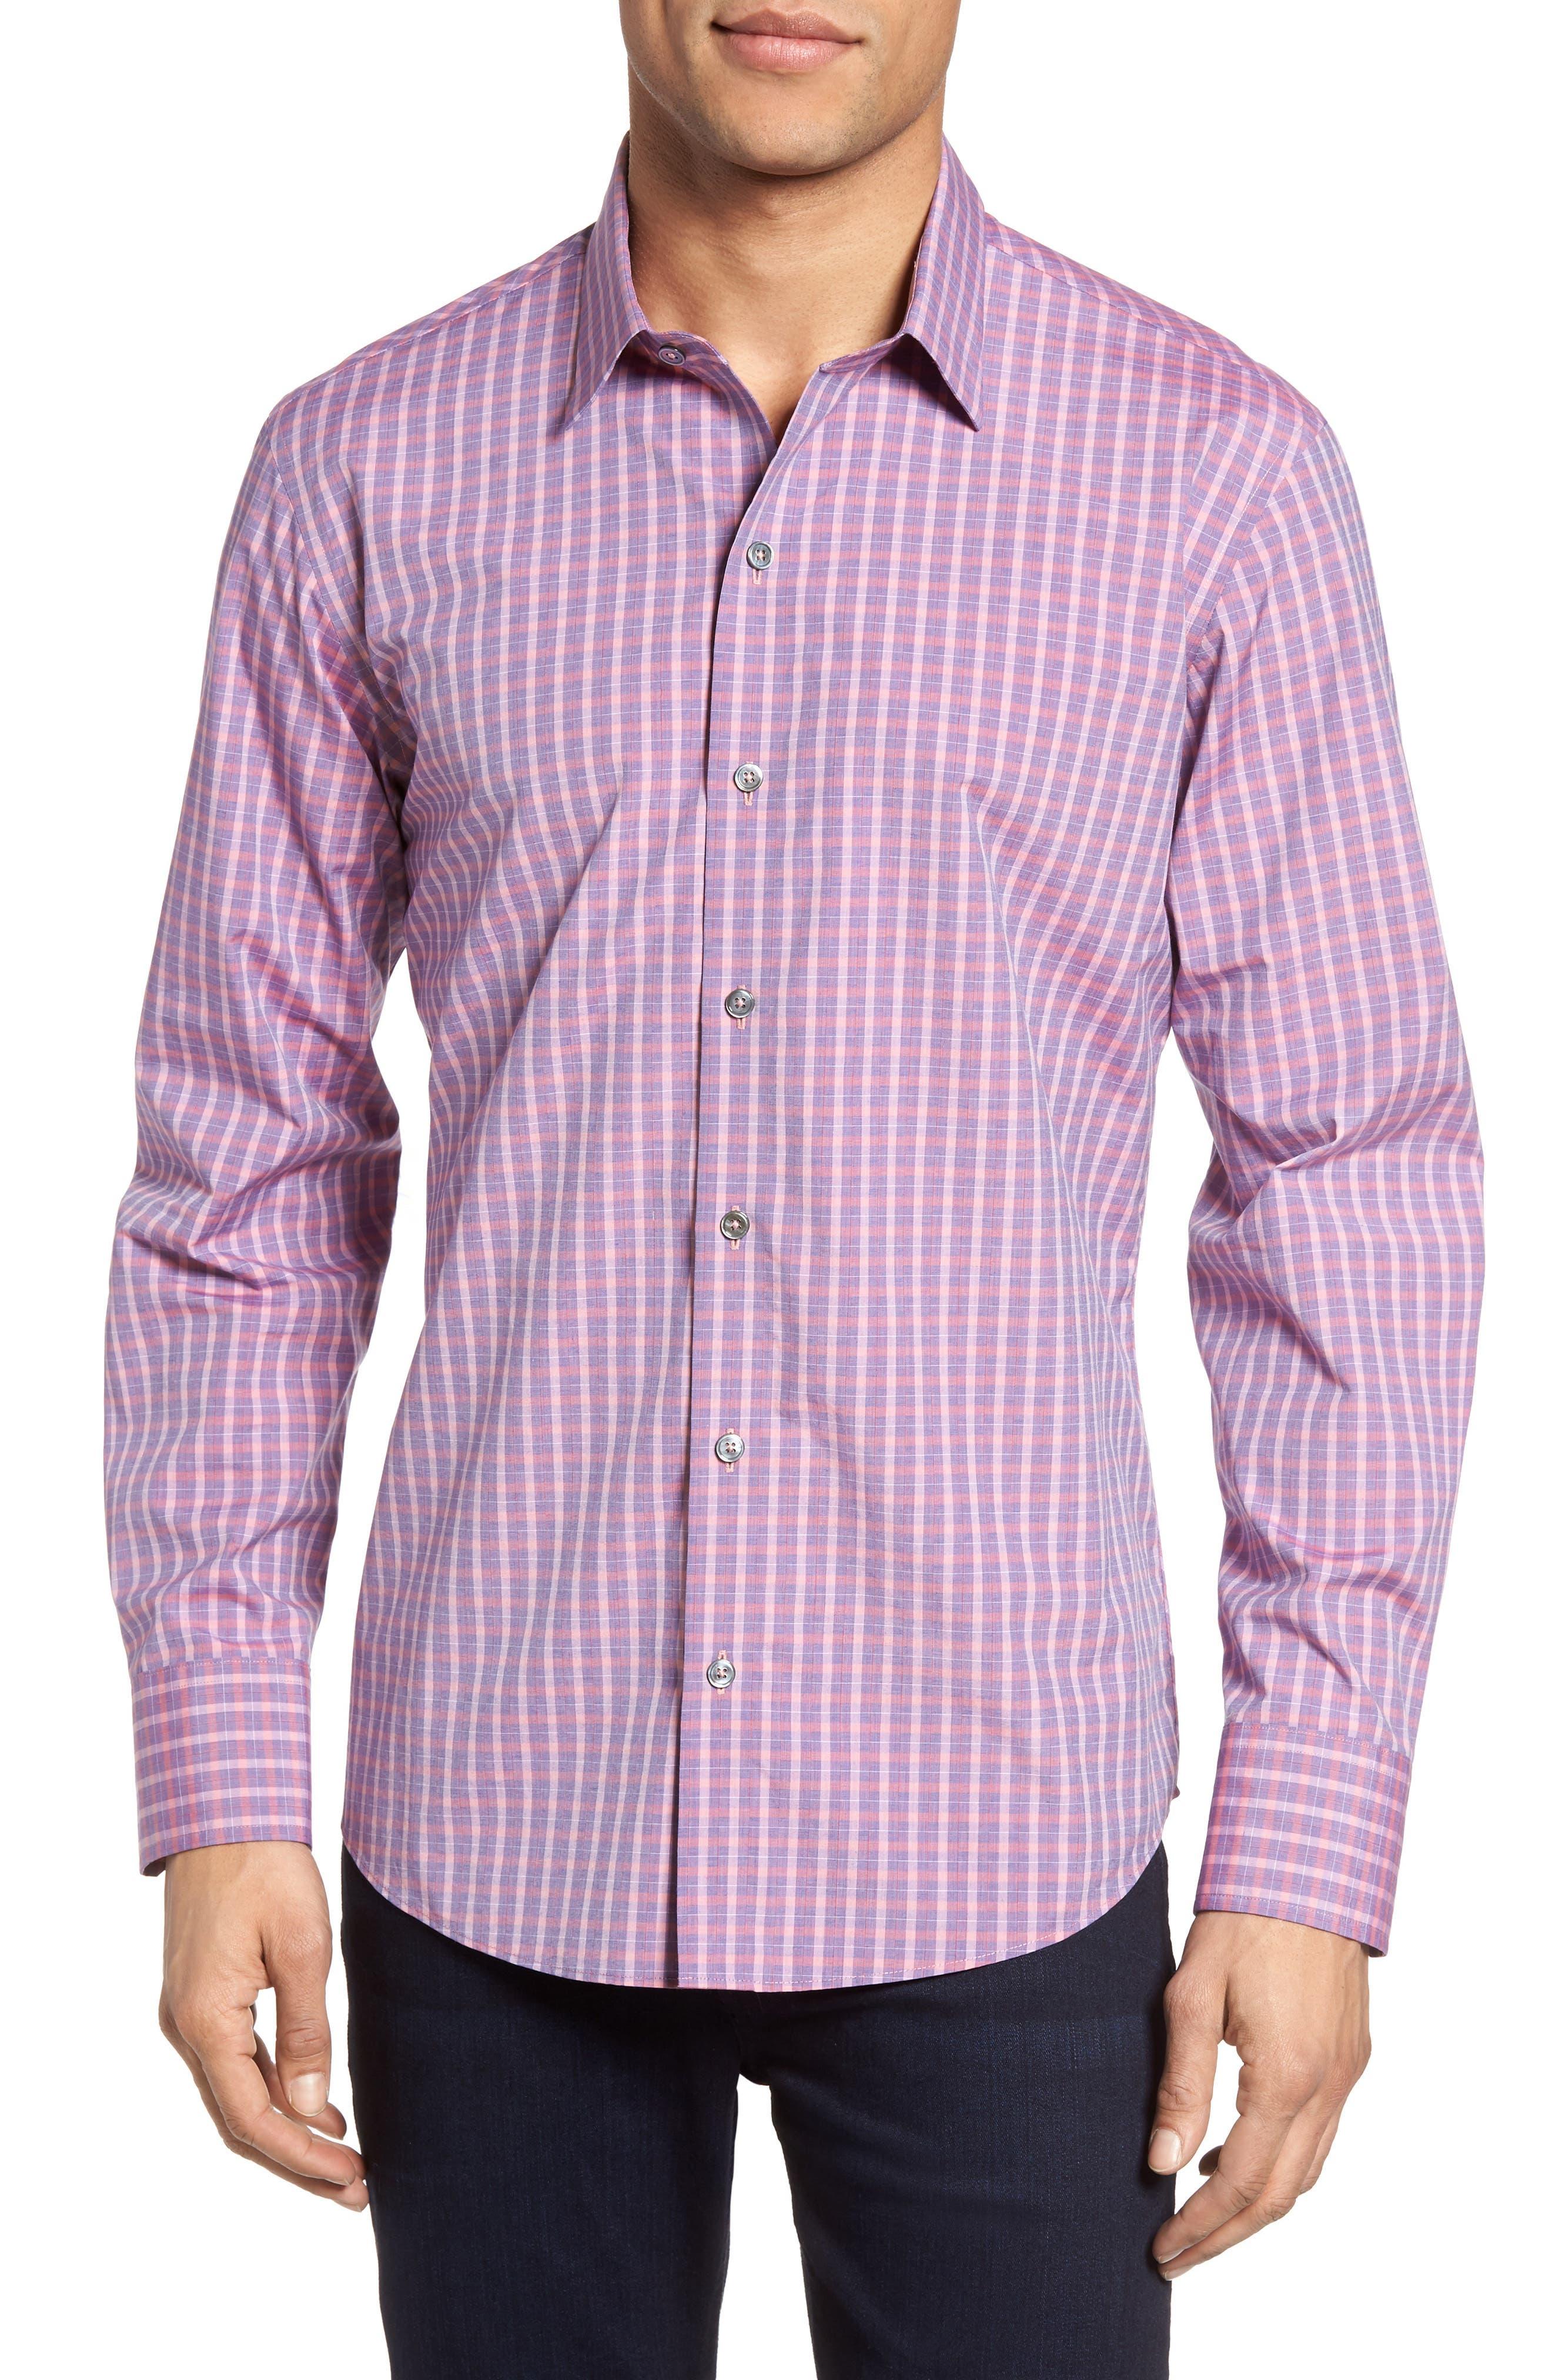 Main Image - Zachary Prell Trim Fit Plaid Sport Shirt